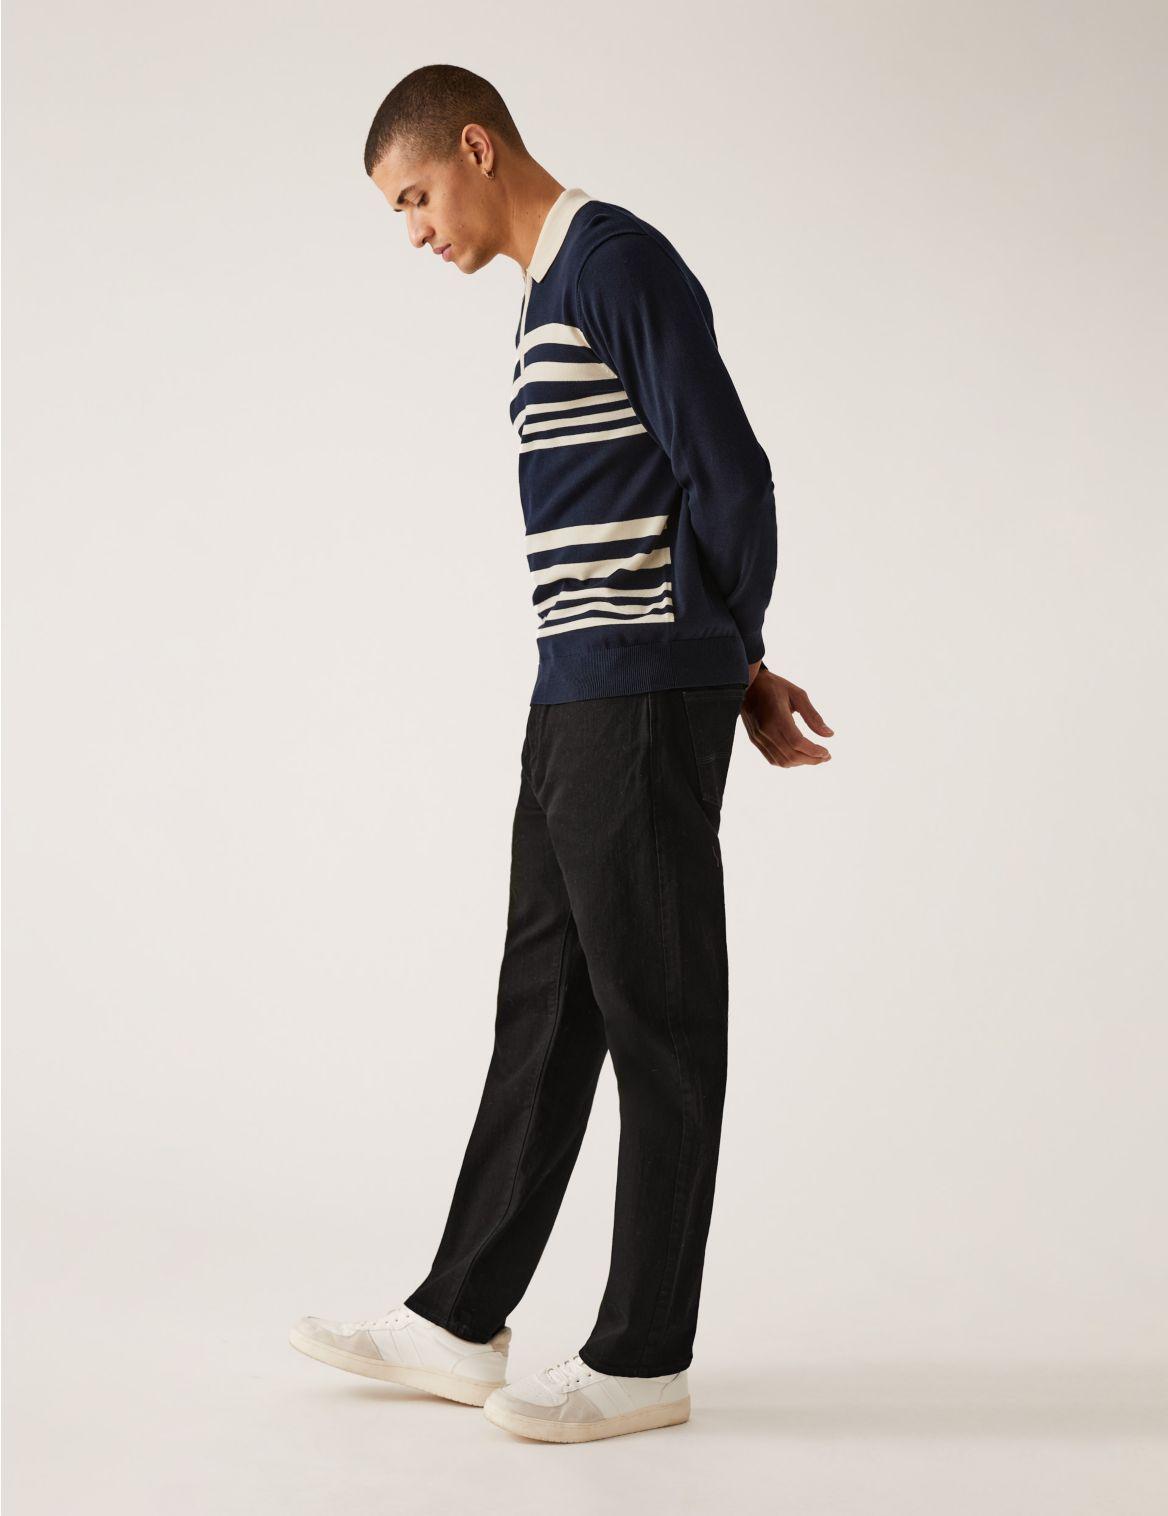 Waterbestendige jeans met normale